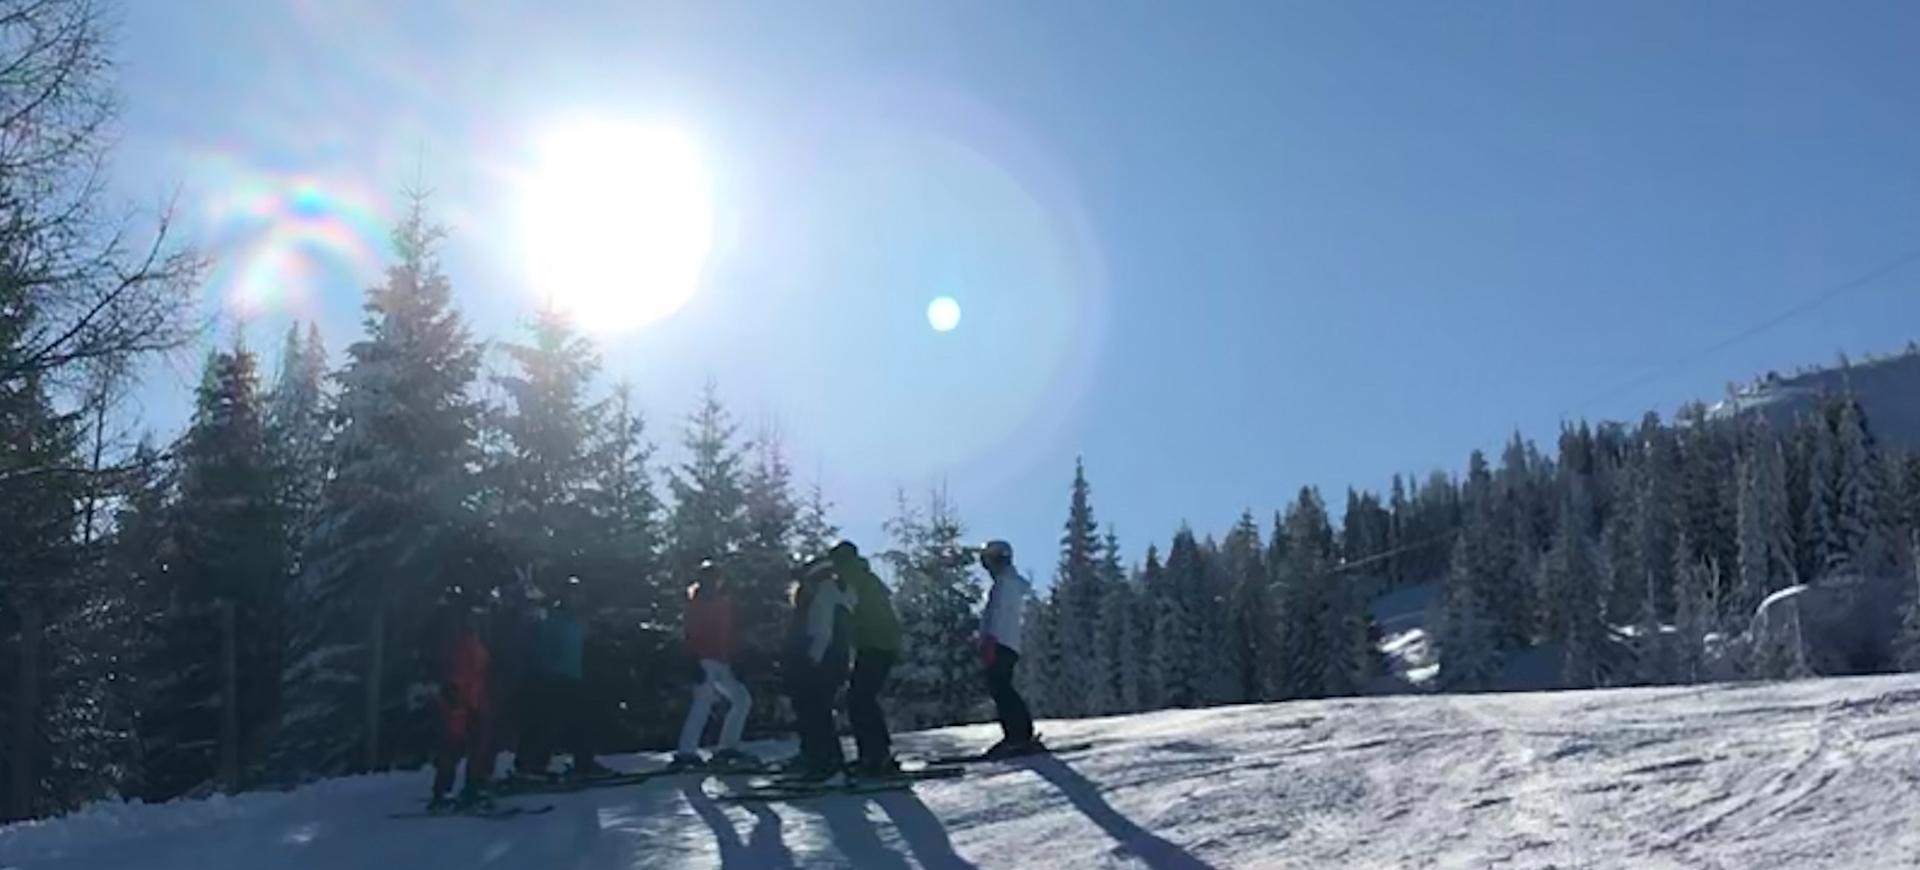 Header, Kostgymnasium, Ski (1)